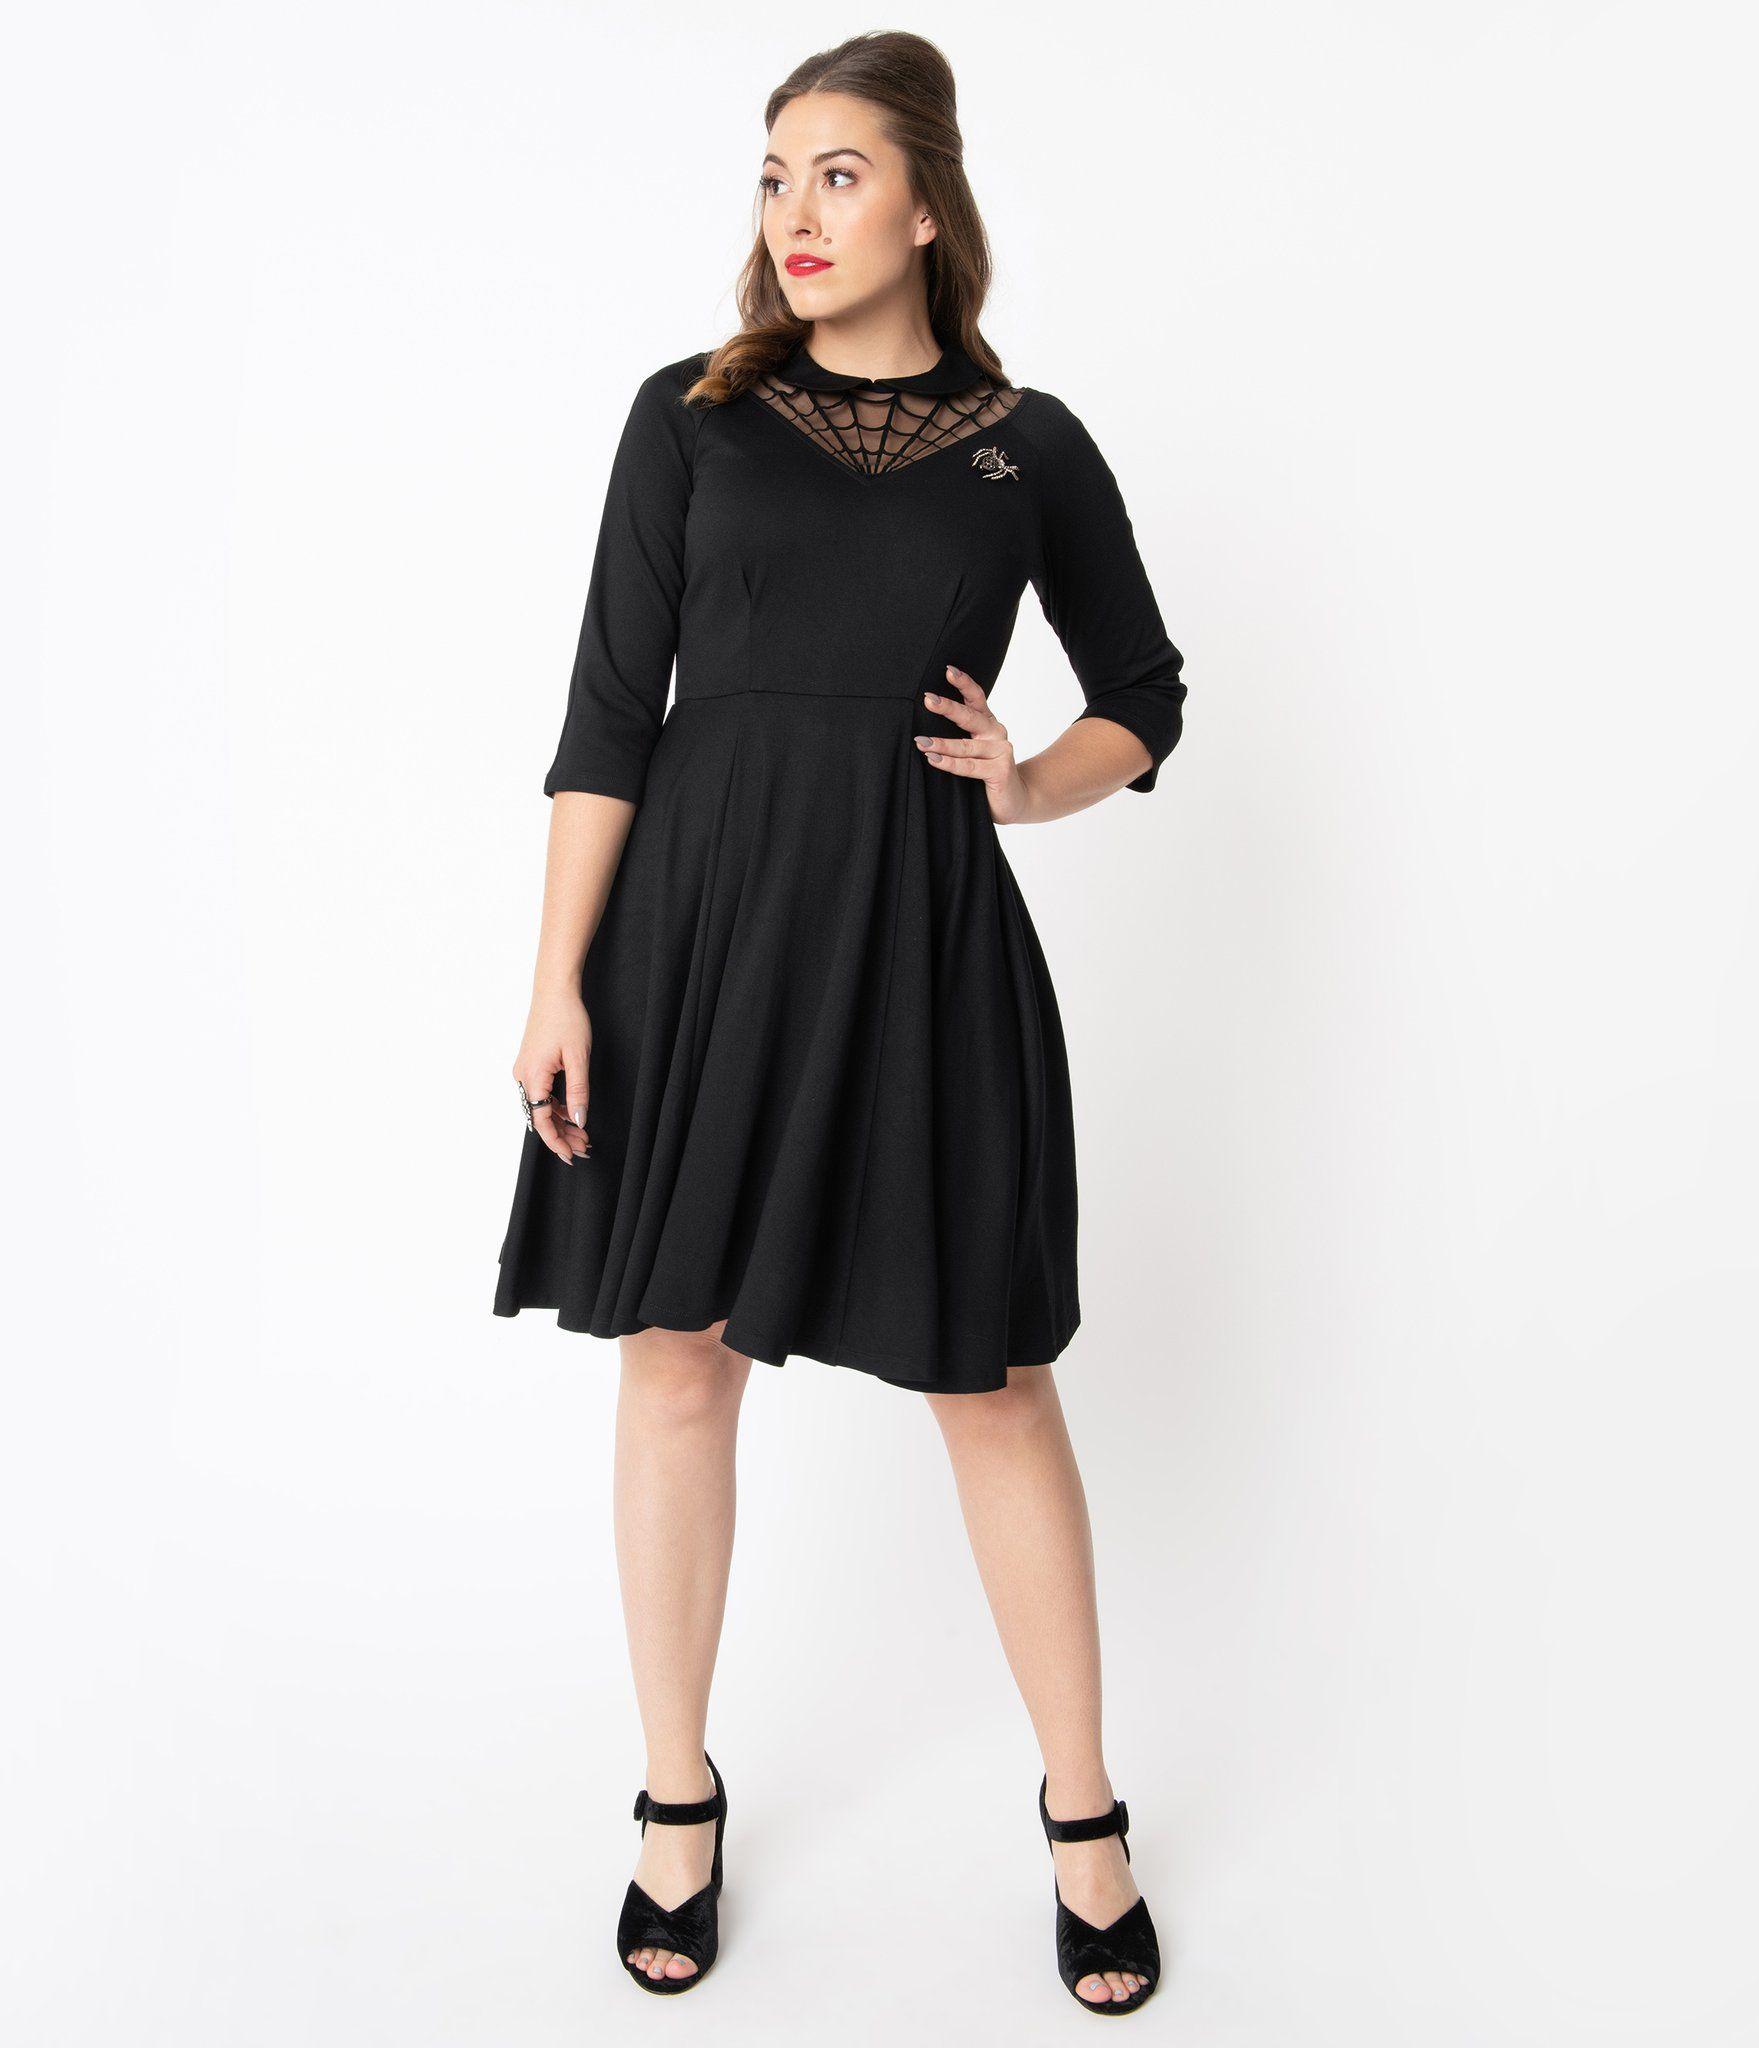 Unique Vintage Black Spiderweb Endora Fit Flare Dress Mod And Retro Clothing Flare Dress Fit Flare Dress Unique Dresses [ 2048 x 1759 Pixel ]